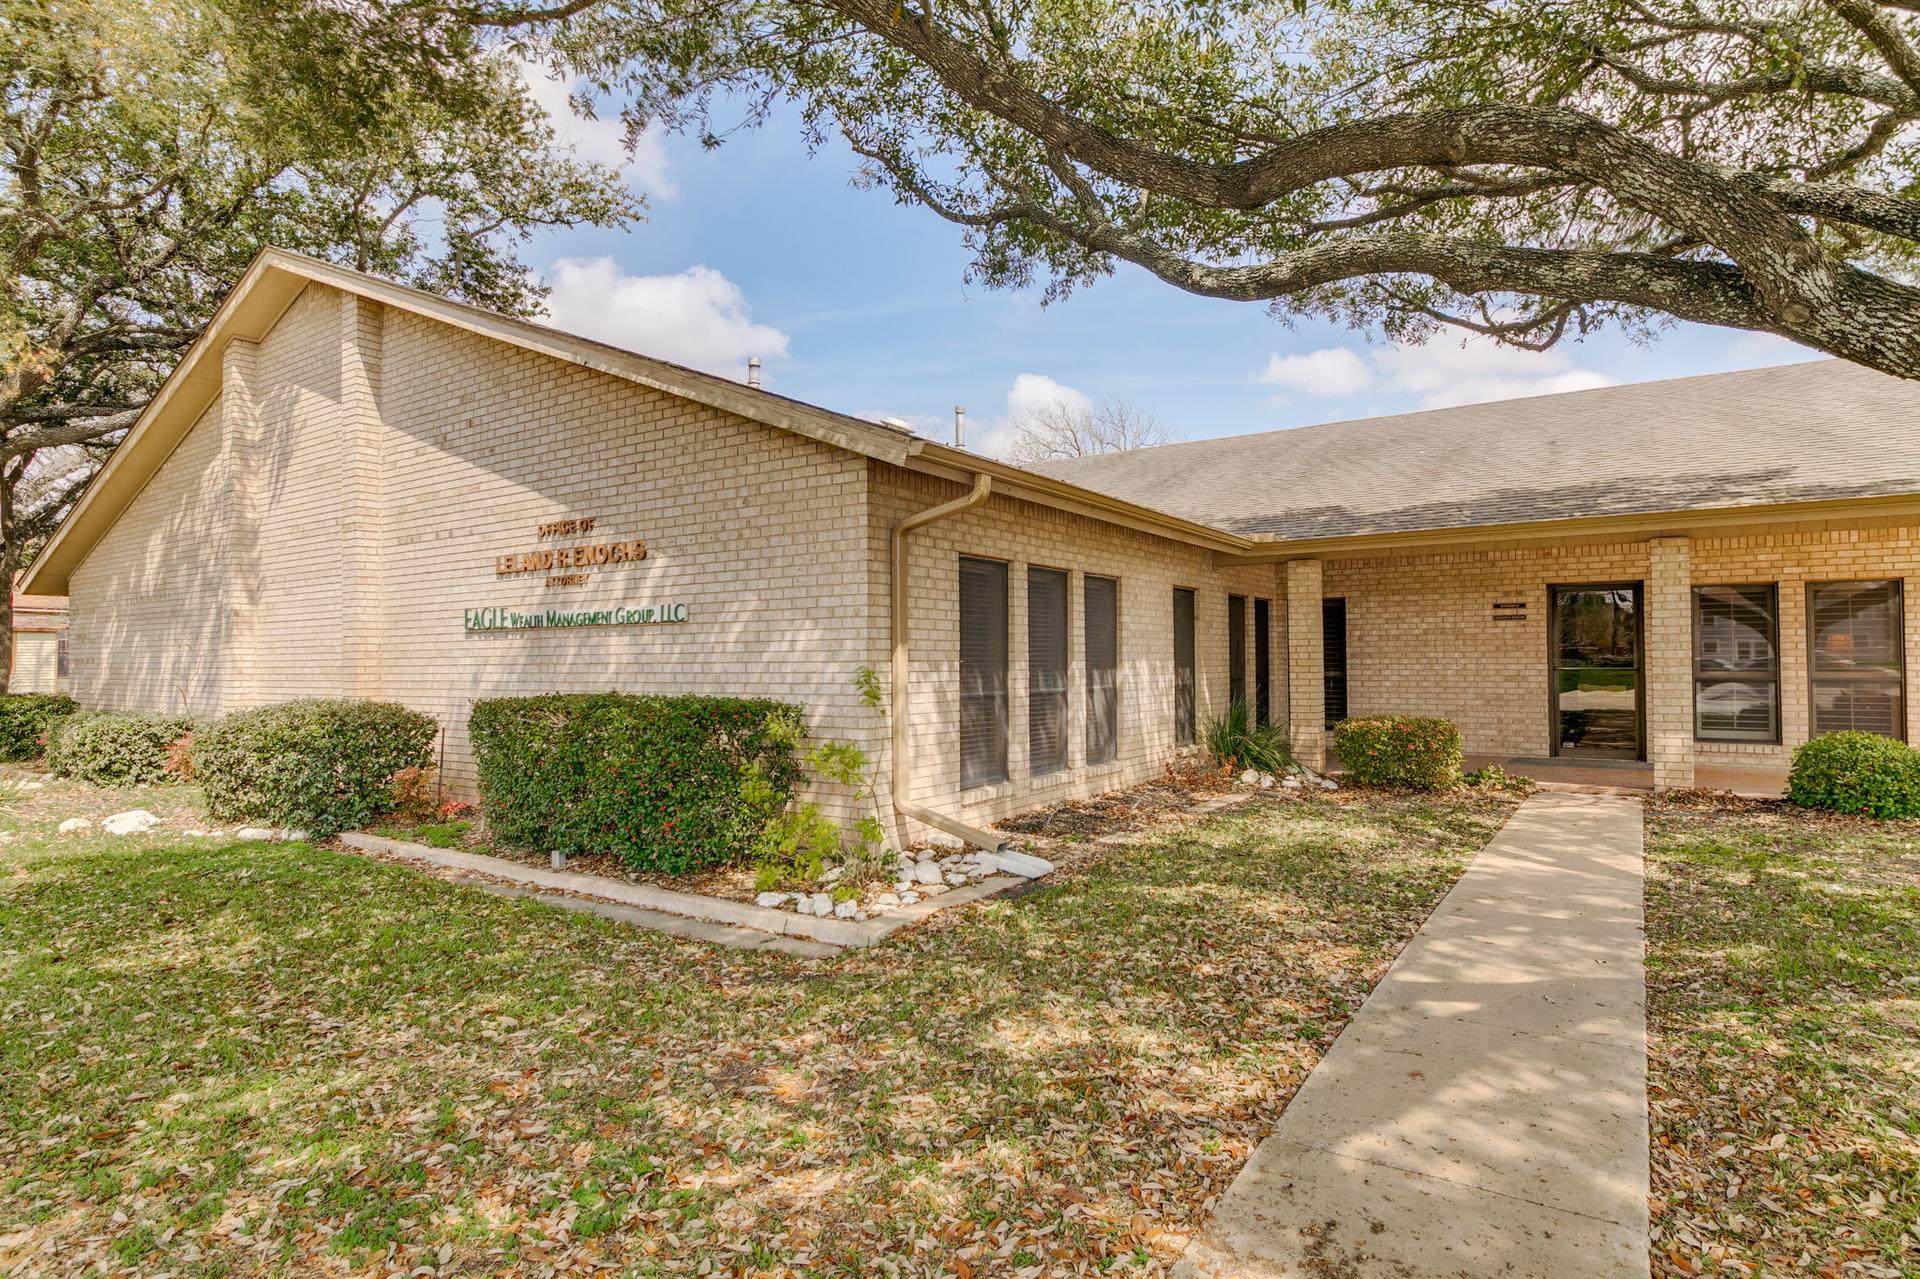 700 N. Main Street, Taylor, TX 76574, US